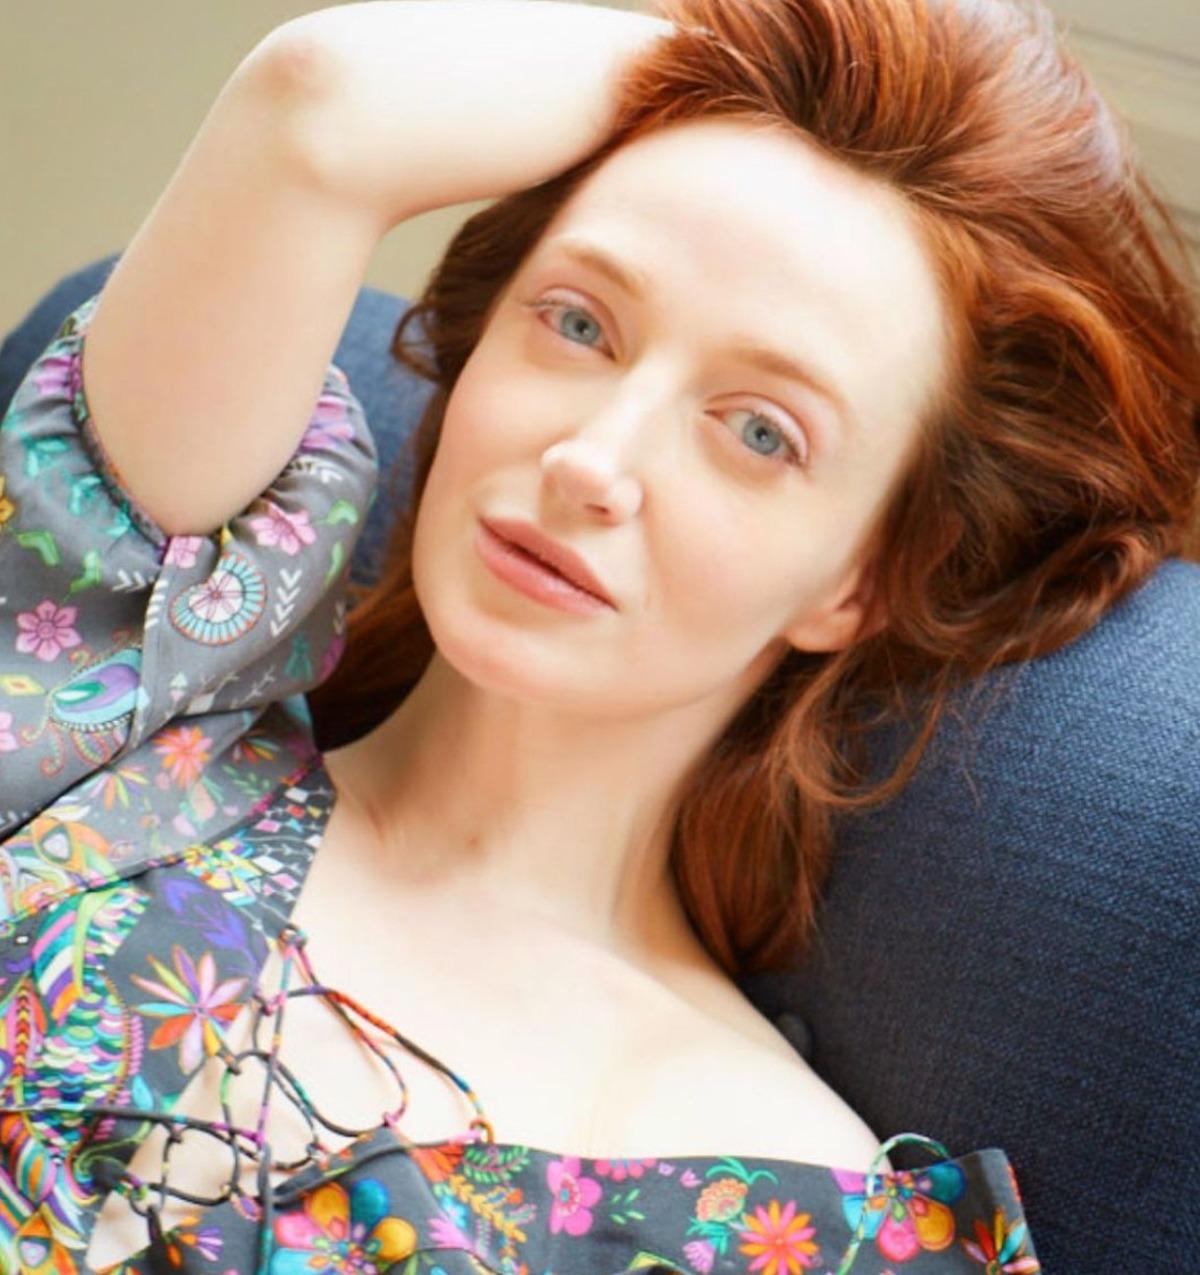 richard grant attore morta moglie joan washington